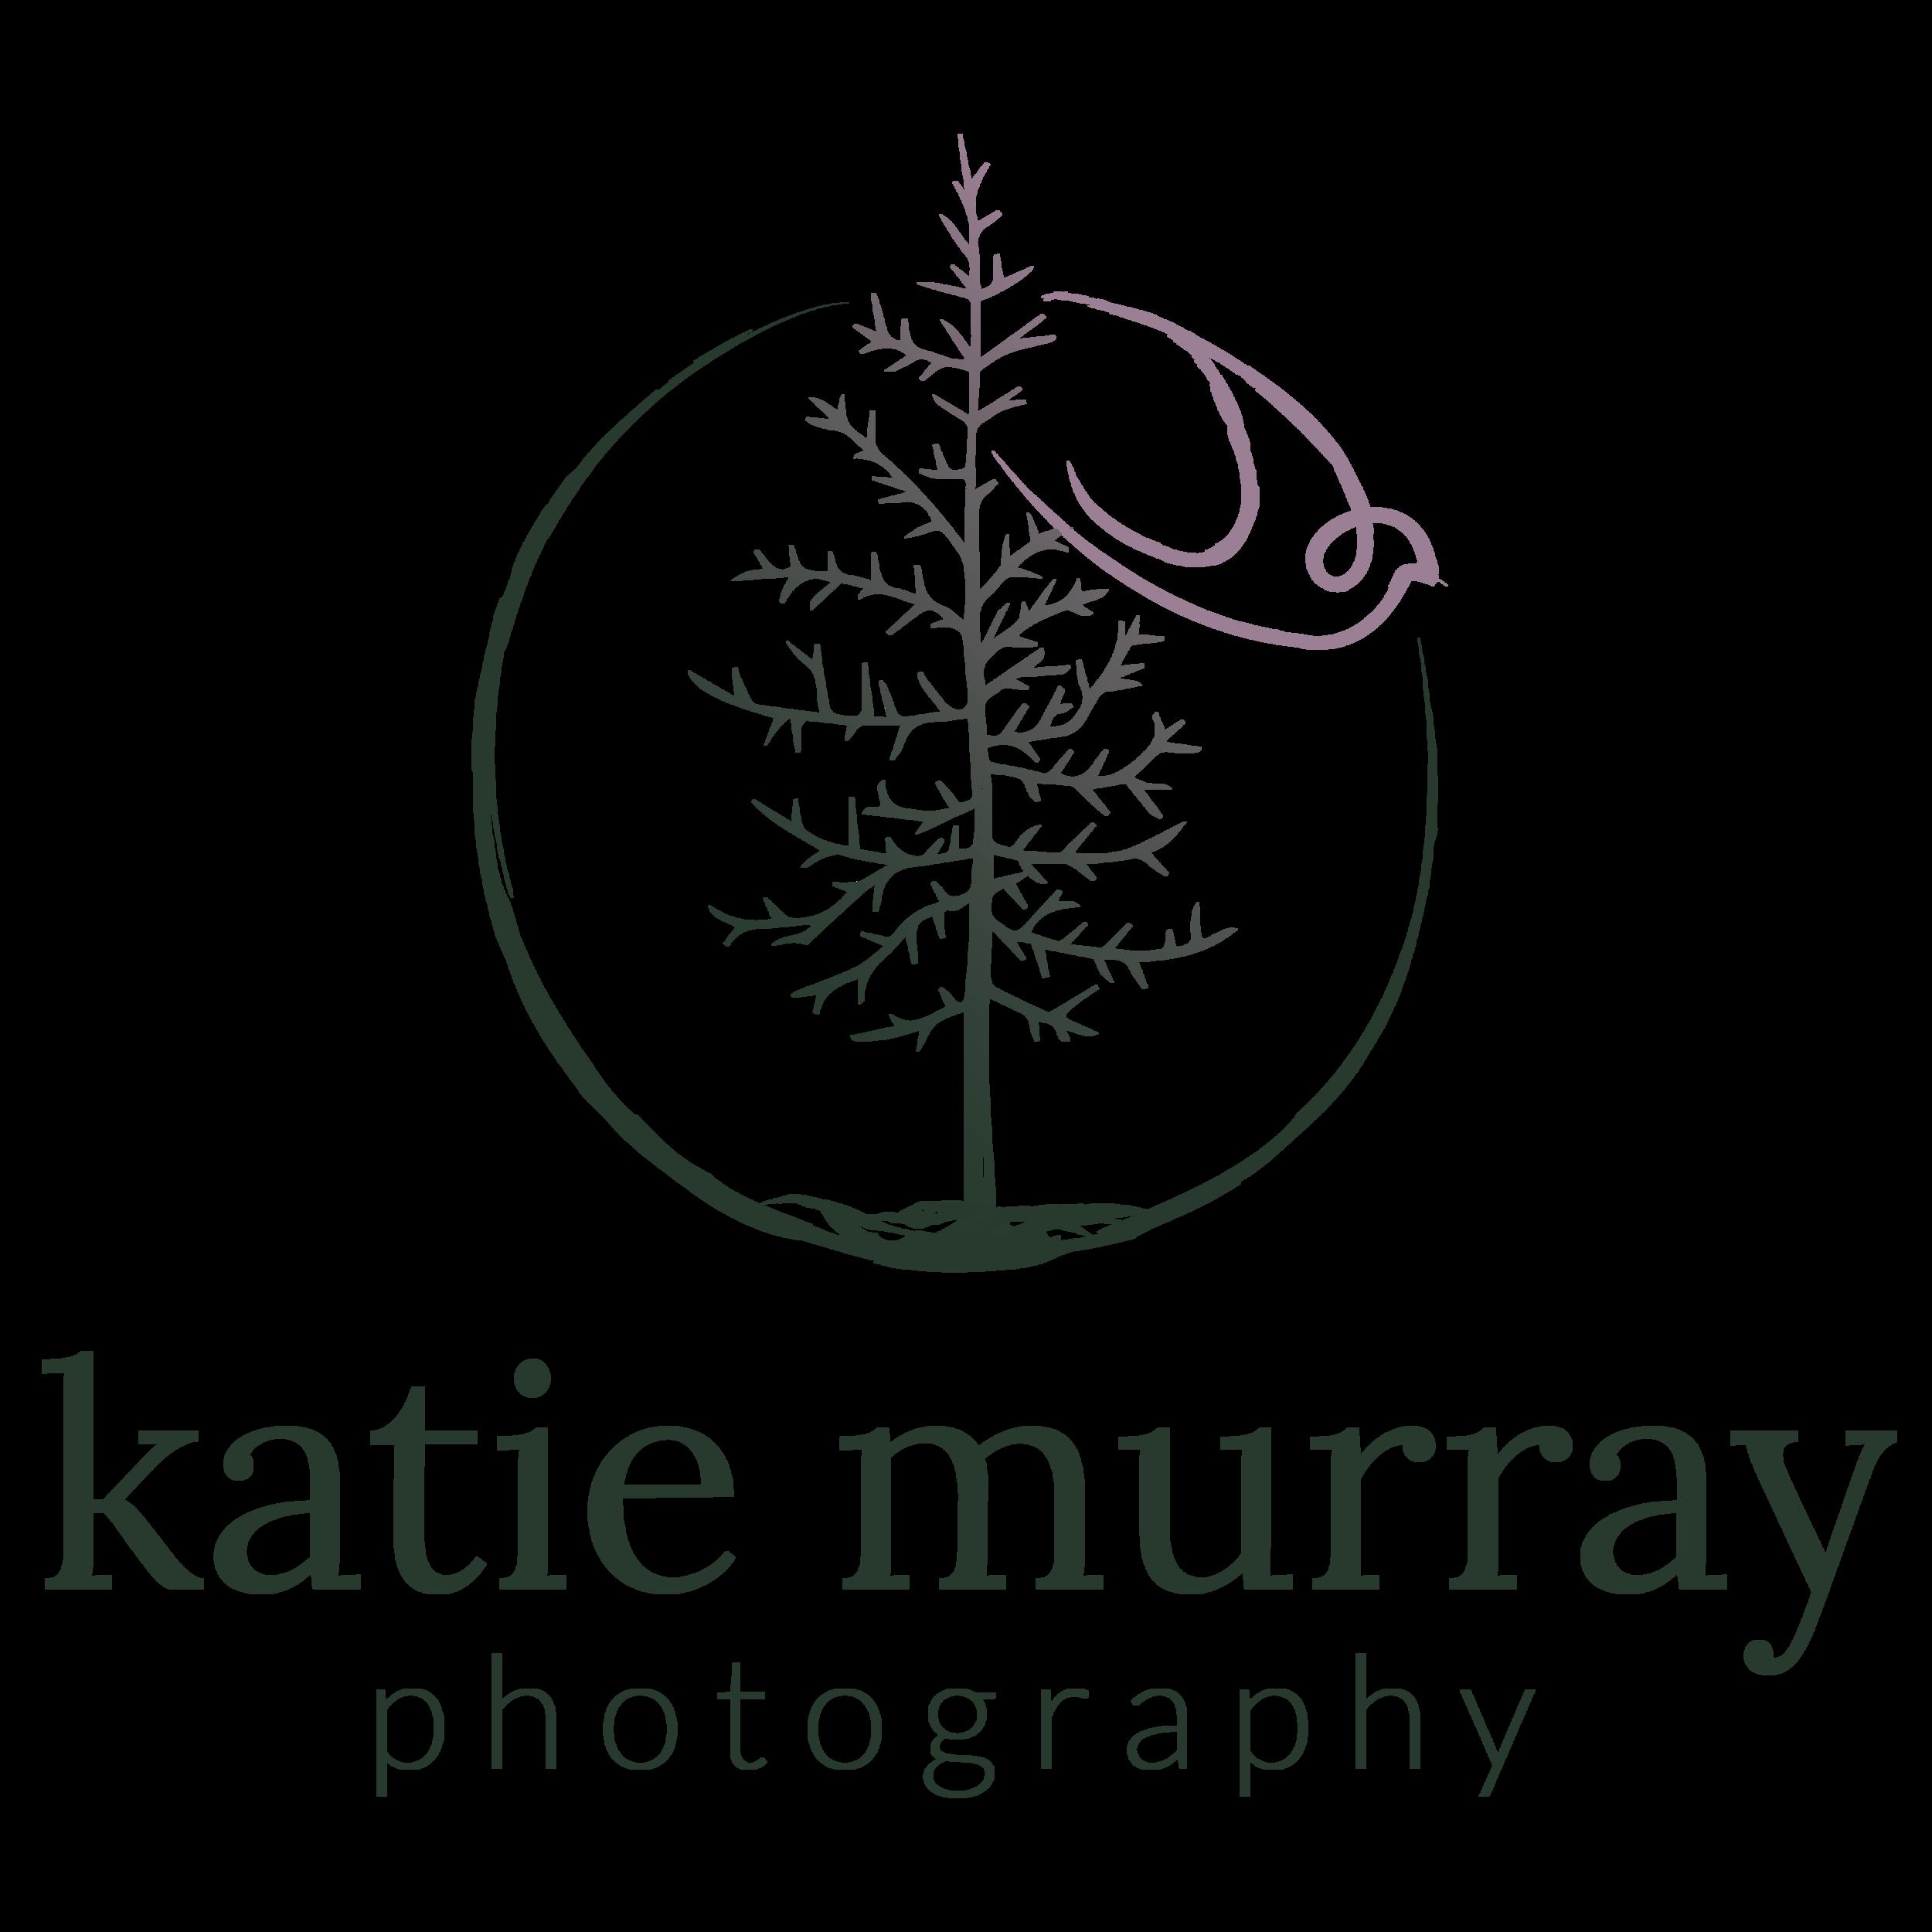 KatieMurray-MainLogoWName-Color.png